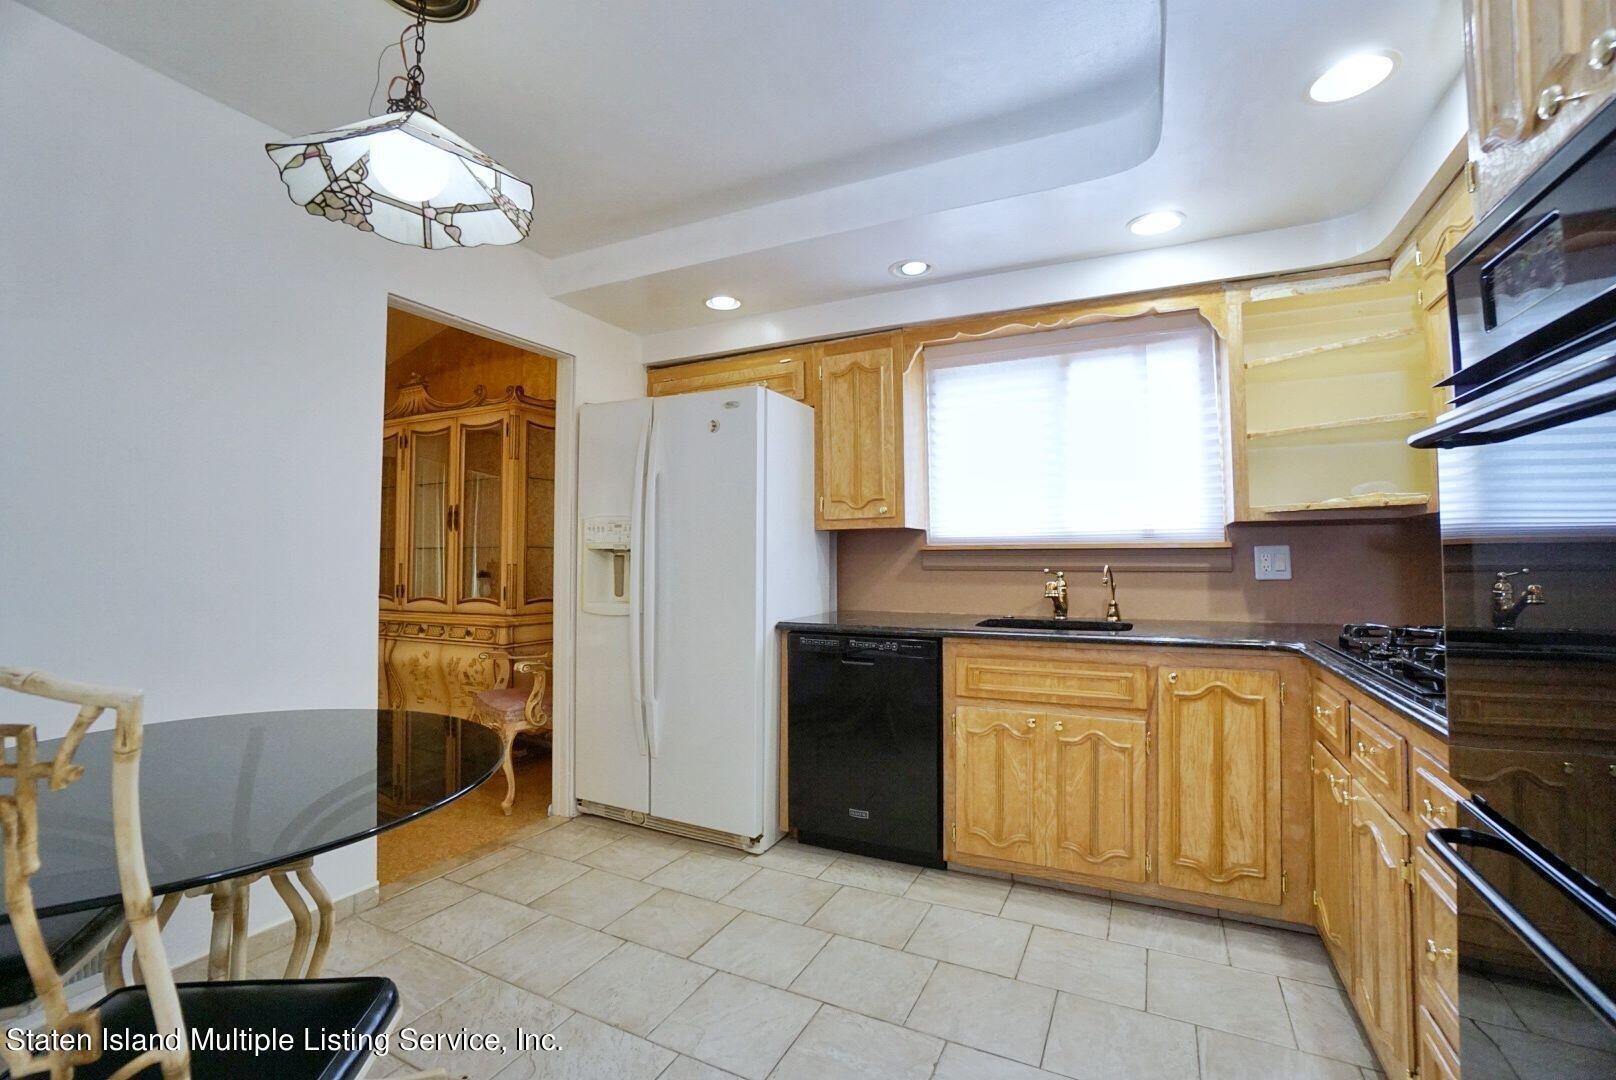 Single Family - Detached 94 Cranford Avenue  Staten Island, NY 10306, MLS-1146620-13